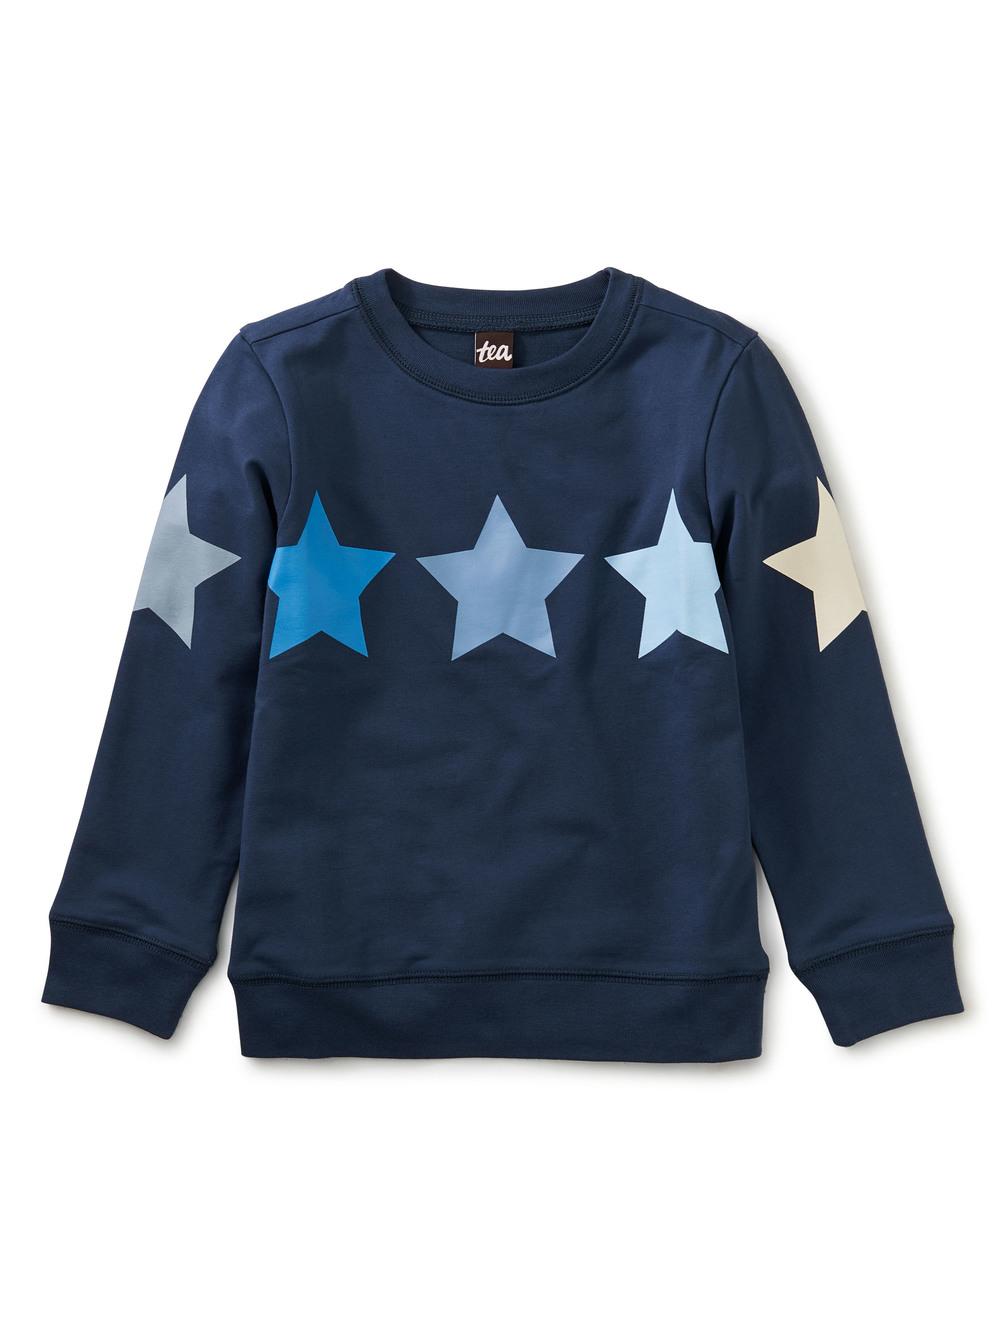 All Star Popover